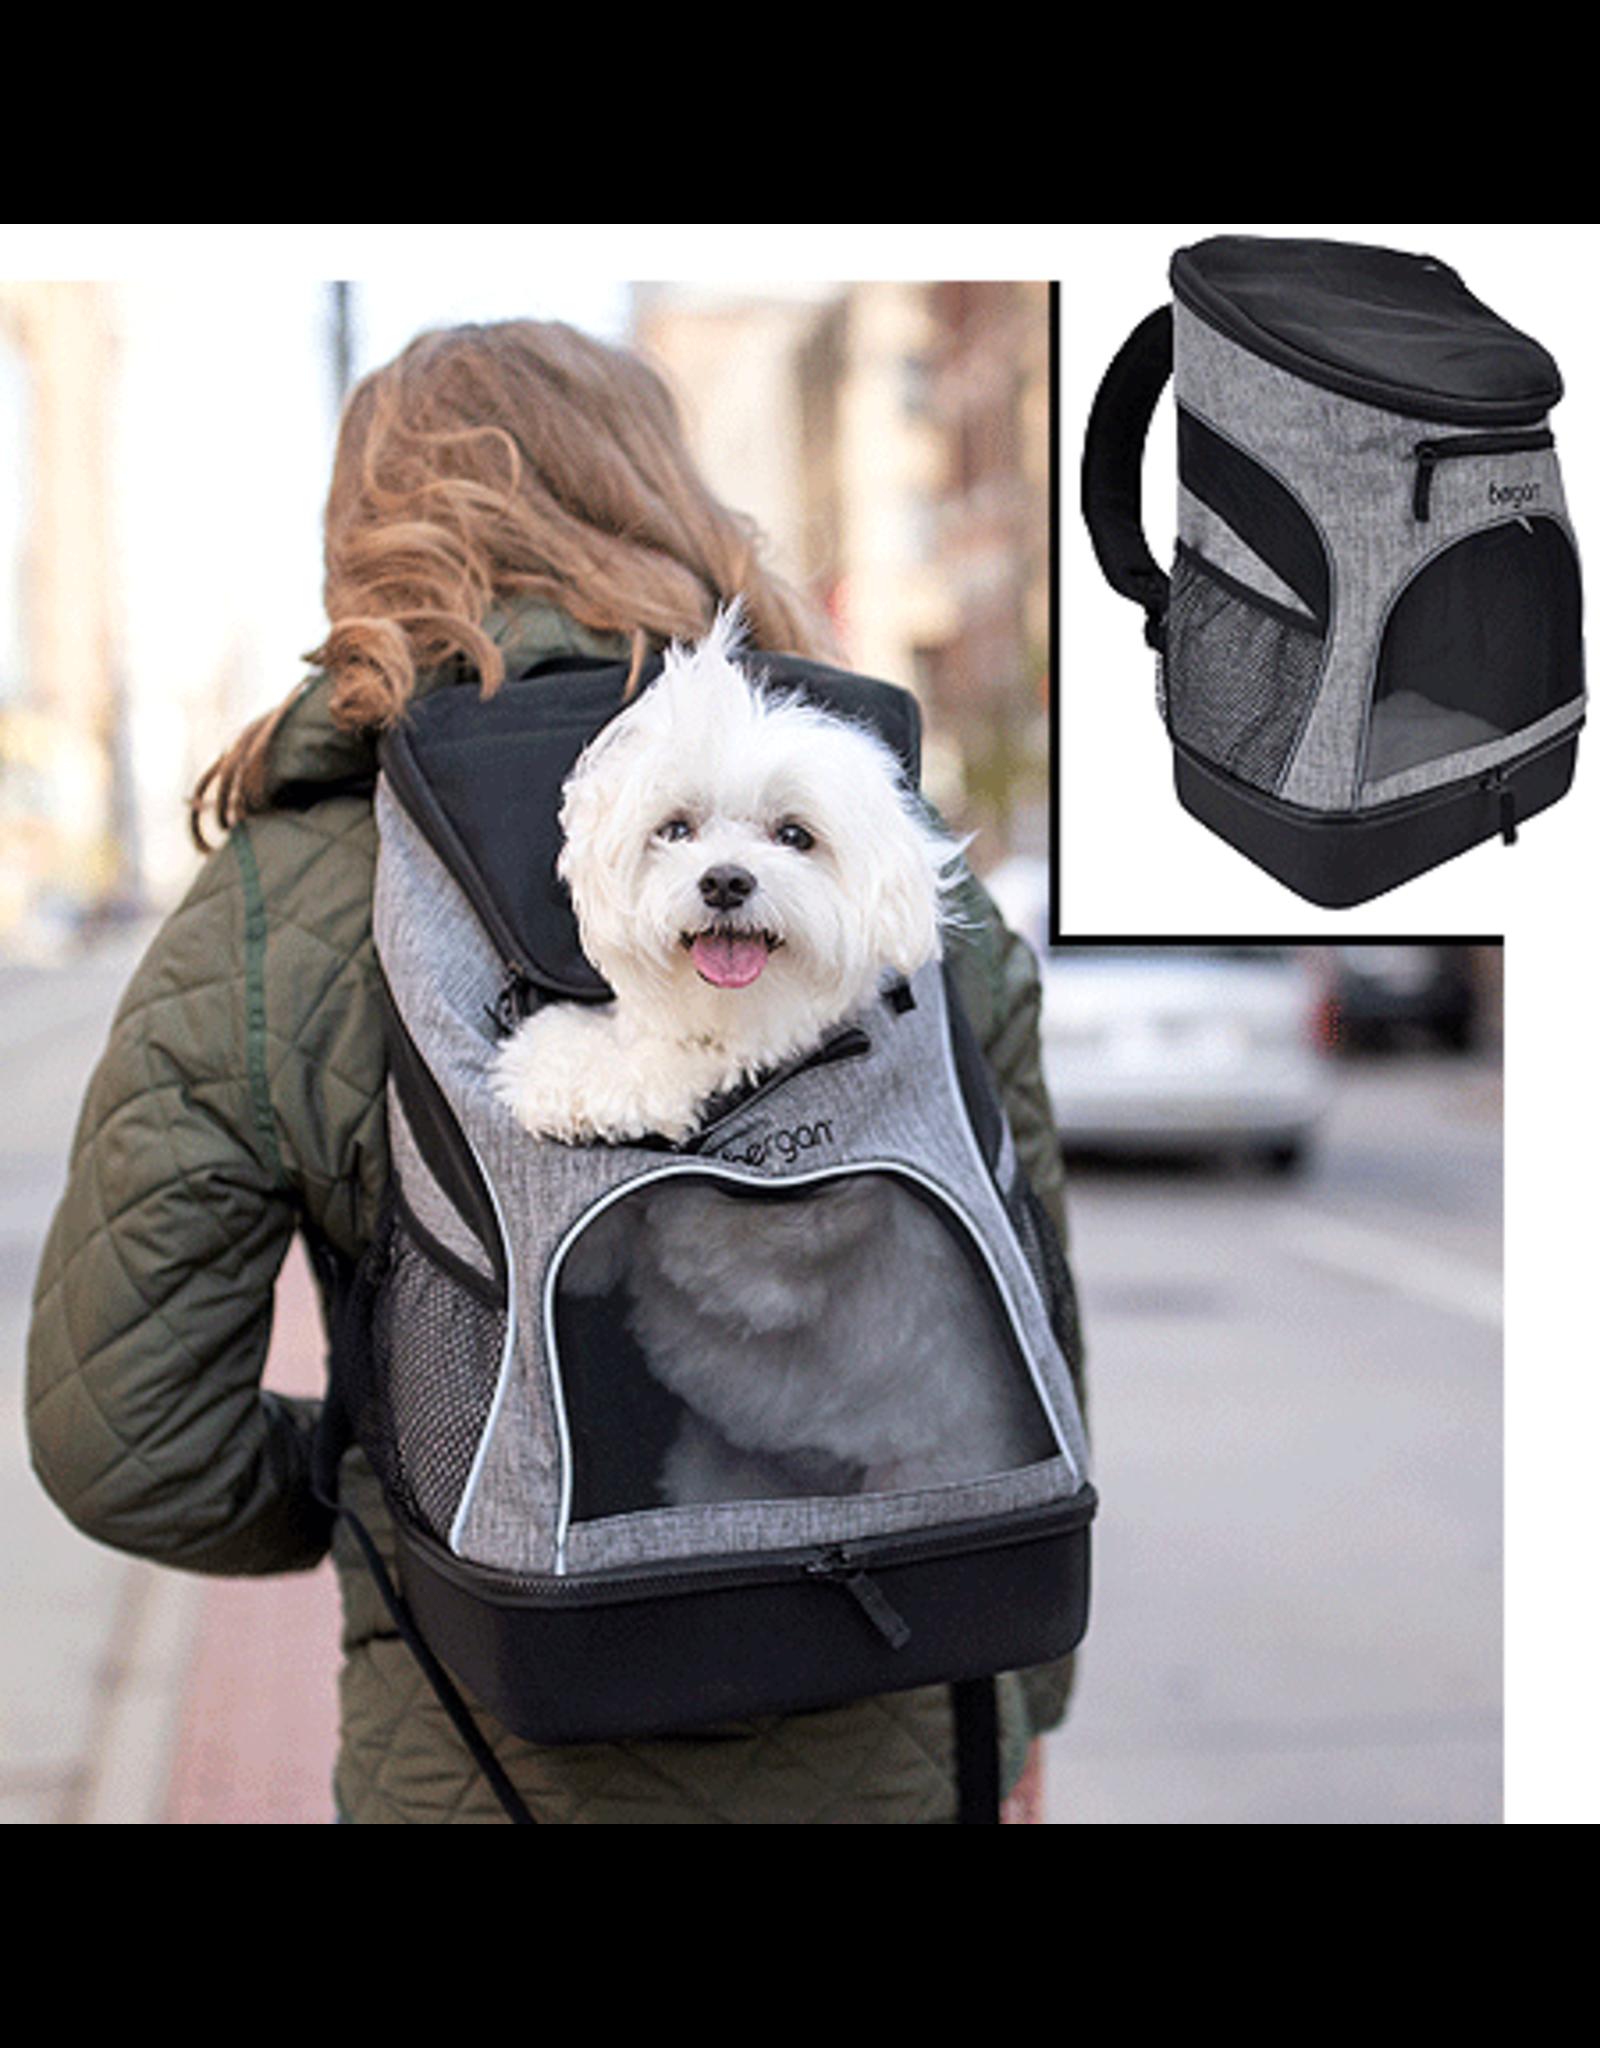 Bergan BERGAN Backpack Carrier Grey